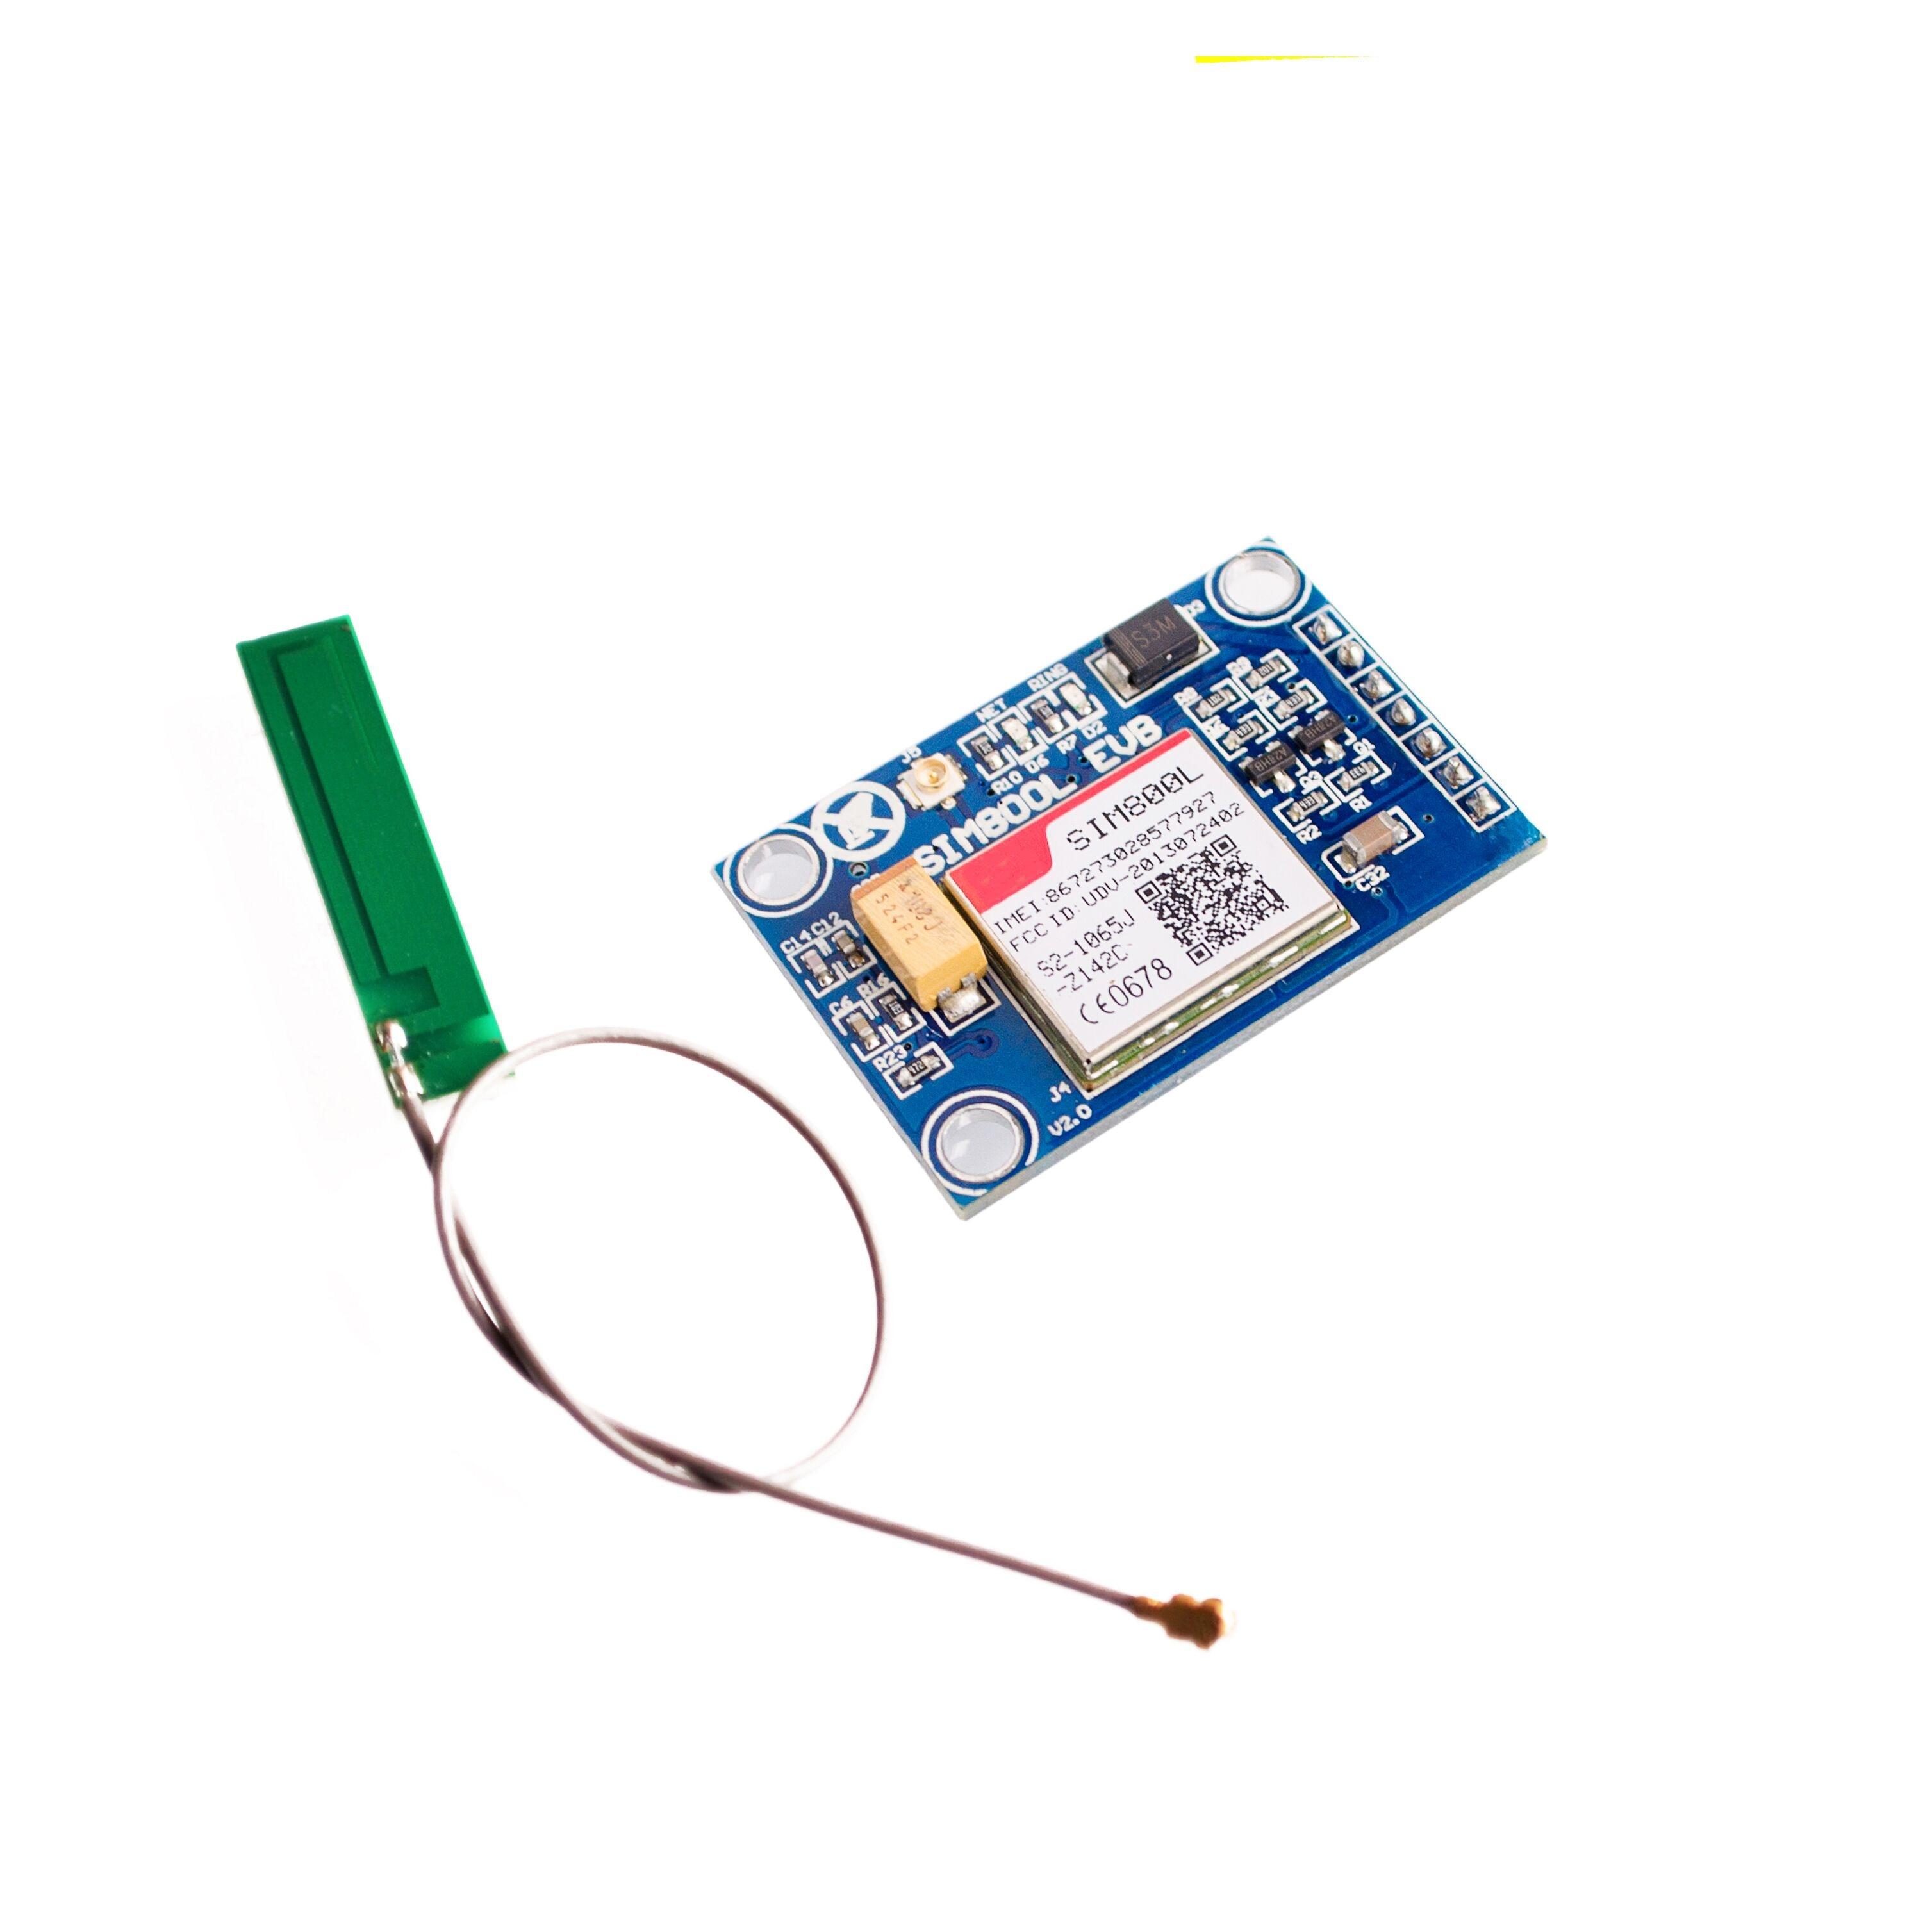 New SIM800L GPRS GSM Module w/ PCB Antenna SIM Board Quad band for MCU for